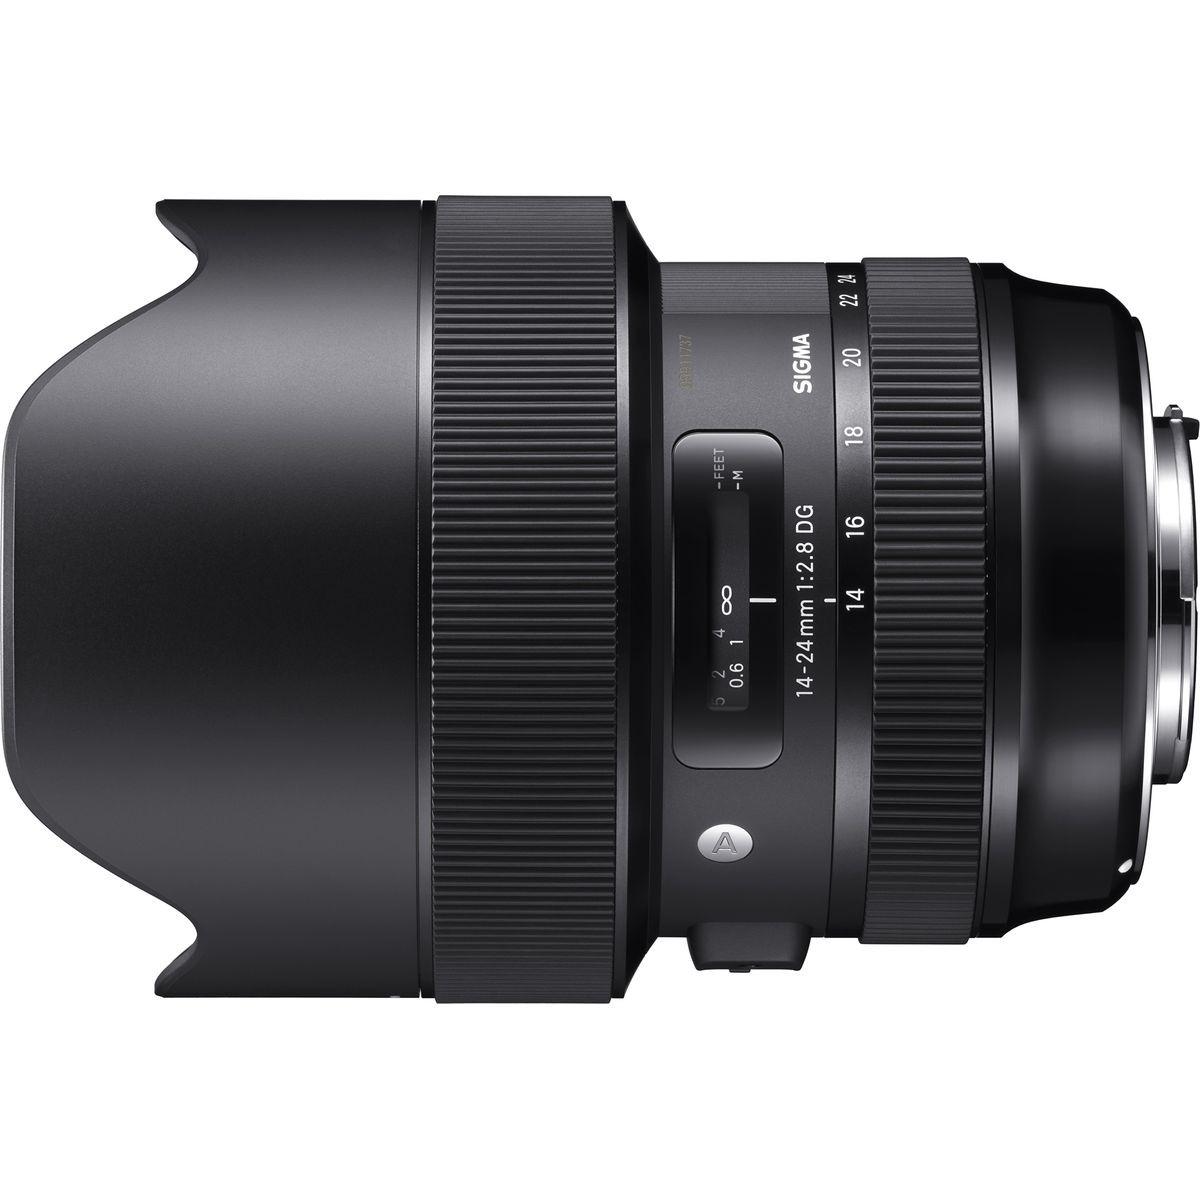 Sigma 14-24mm F2.8 DG HSM Art CANON